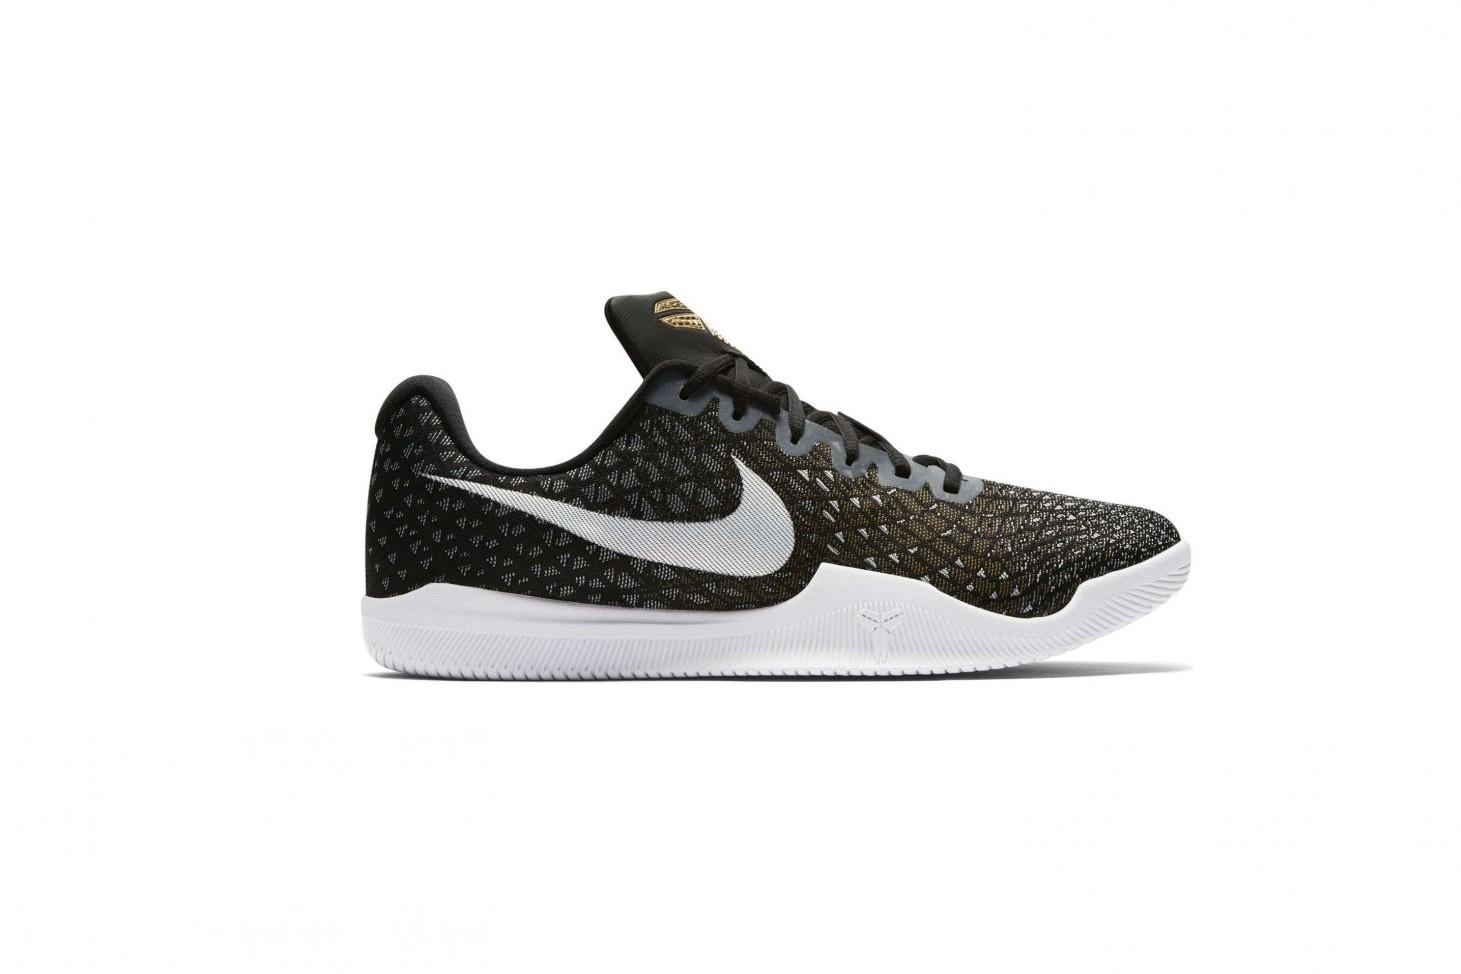 b9d3c1eeb56 Pánské basketbalové boty boty Nike MAMBA INSTINCT